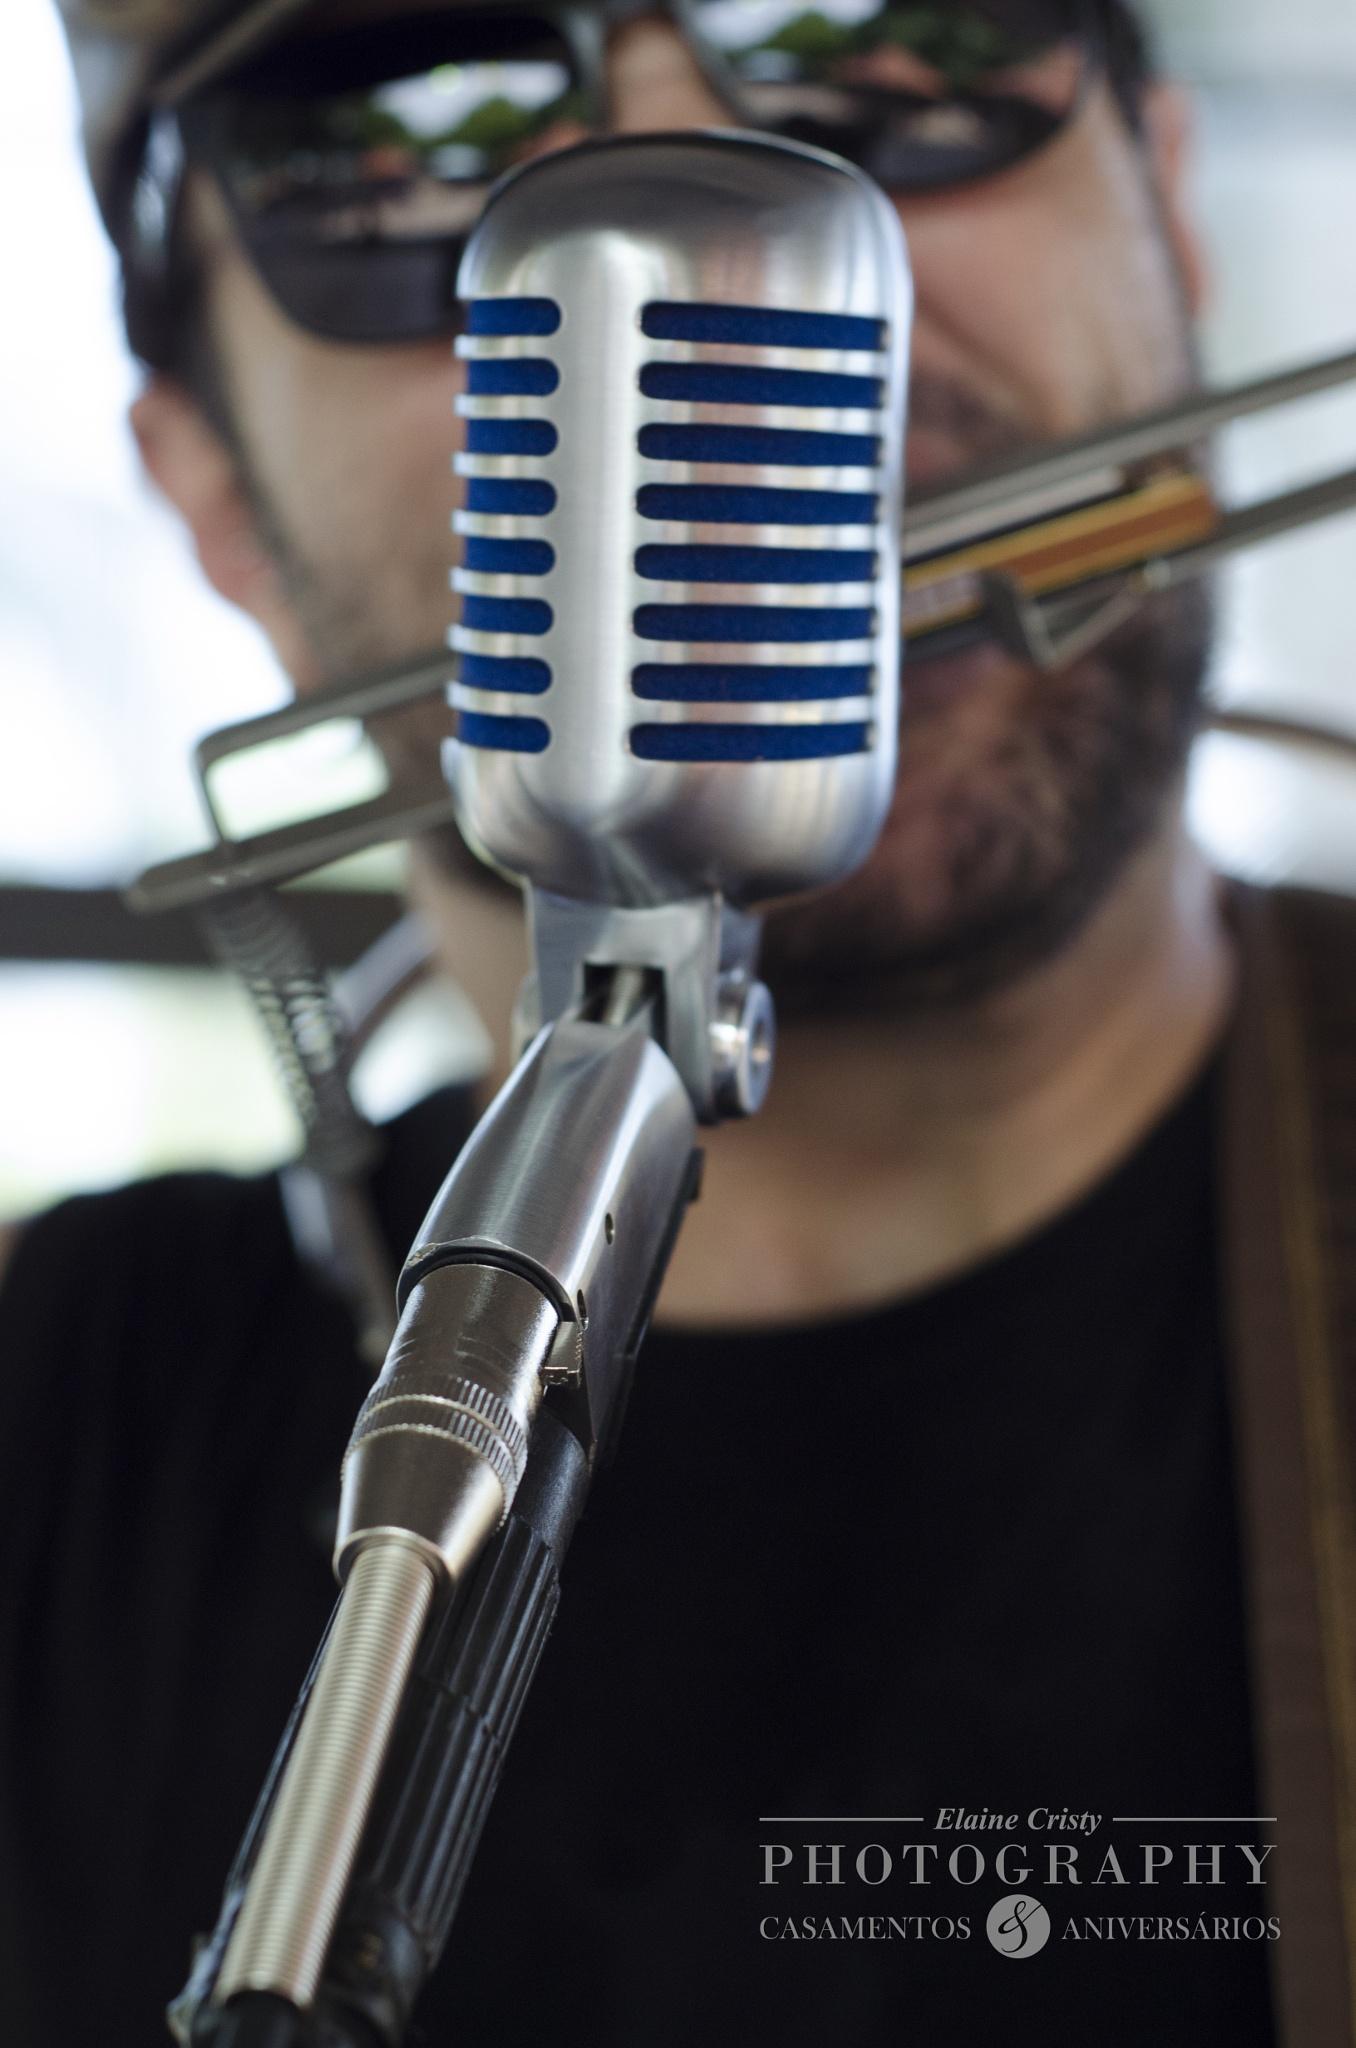 Vocalista de banda de Rock  by Elaine Cristy